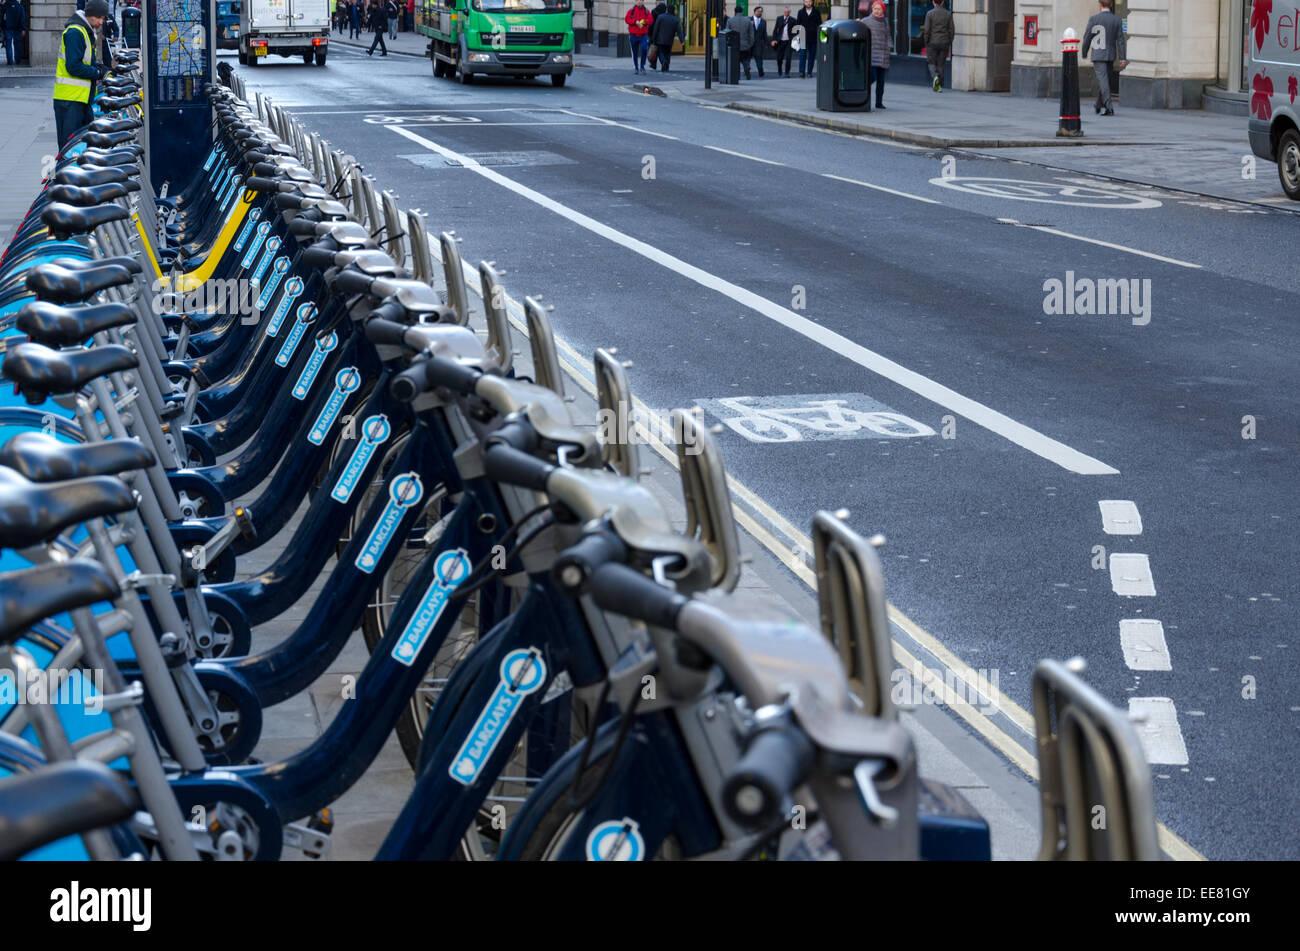 Borris Bikes on Cheapside, London, UK. - Stock Image